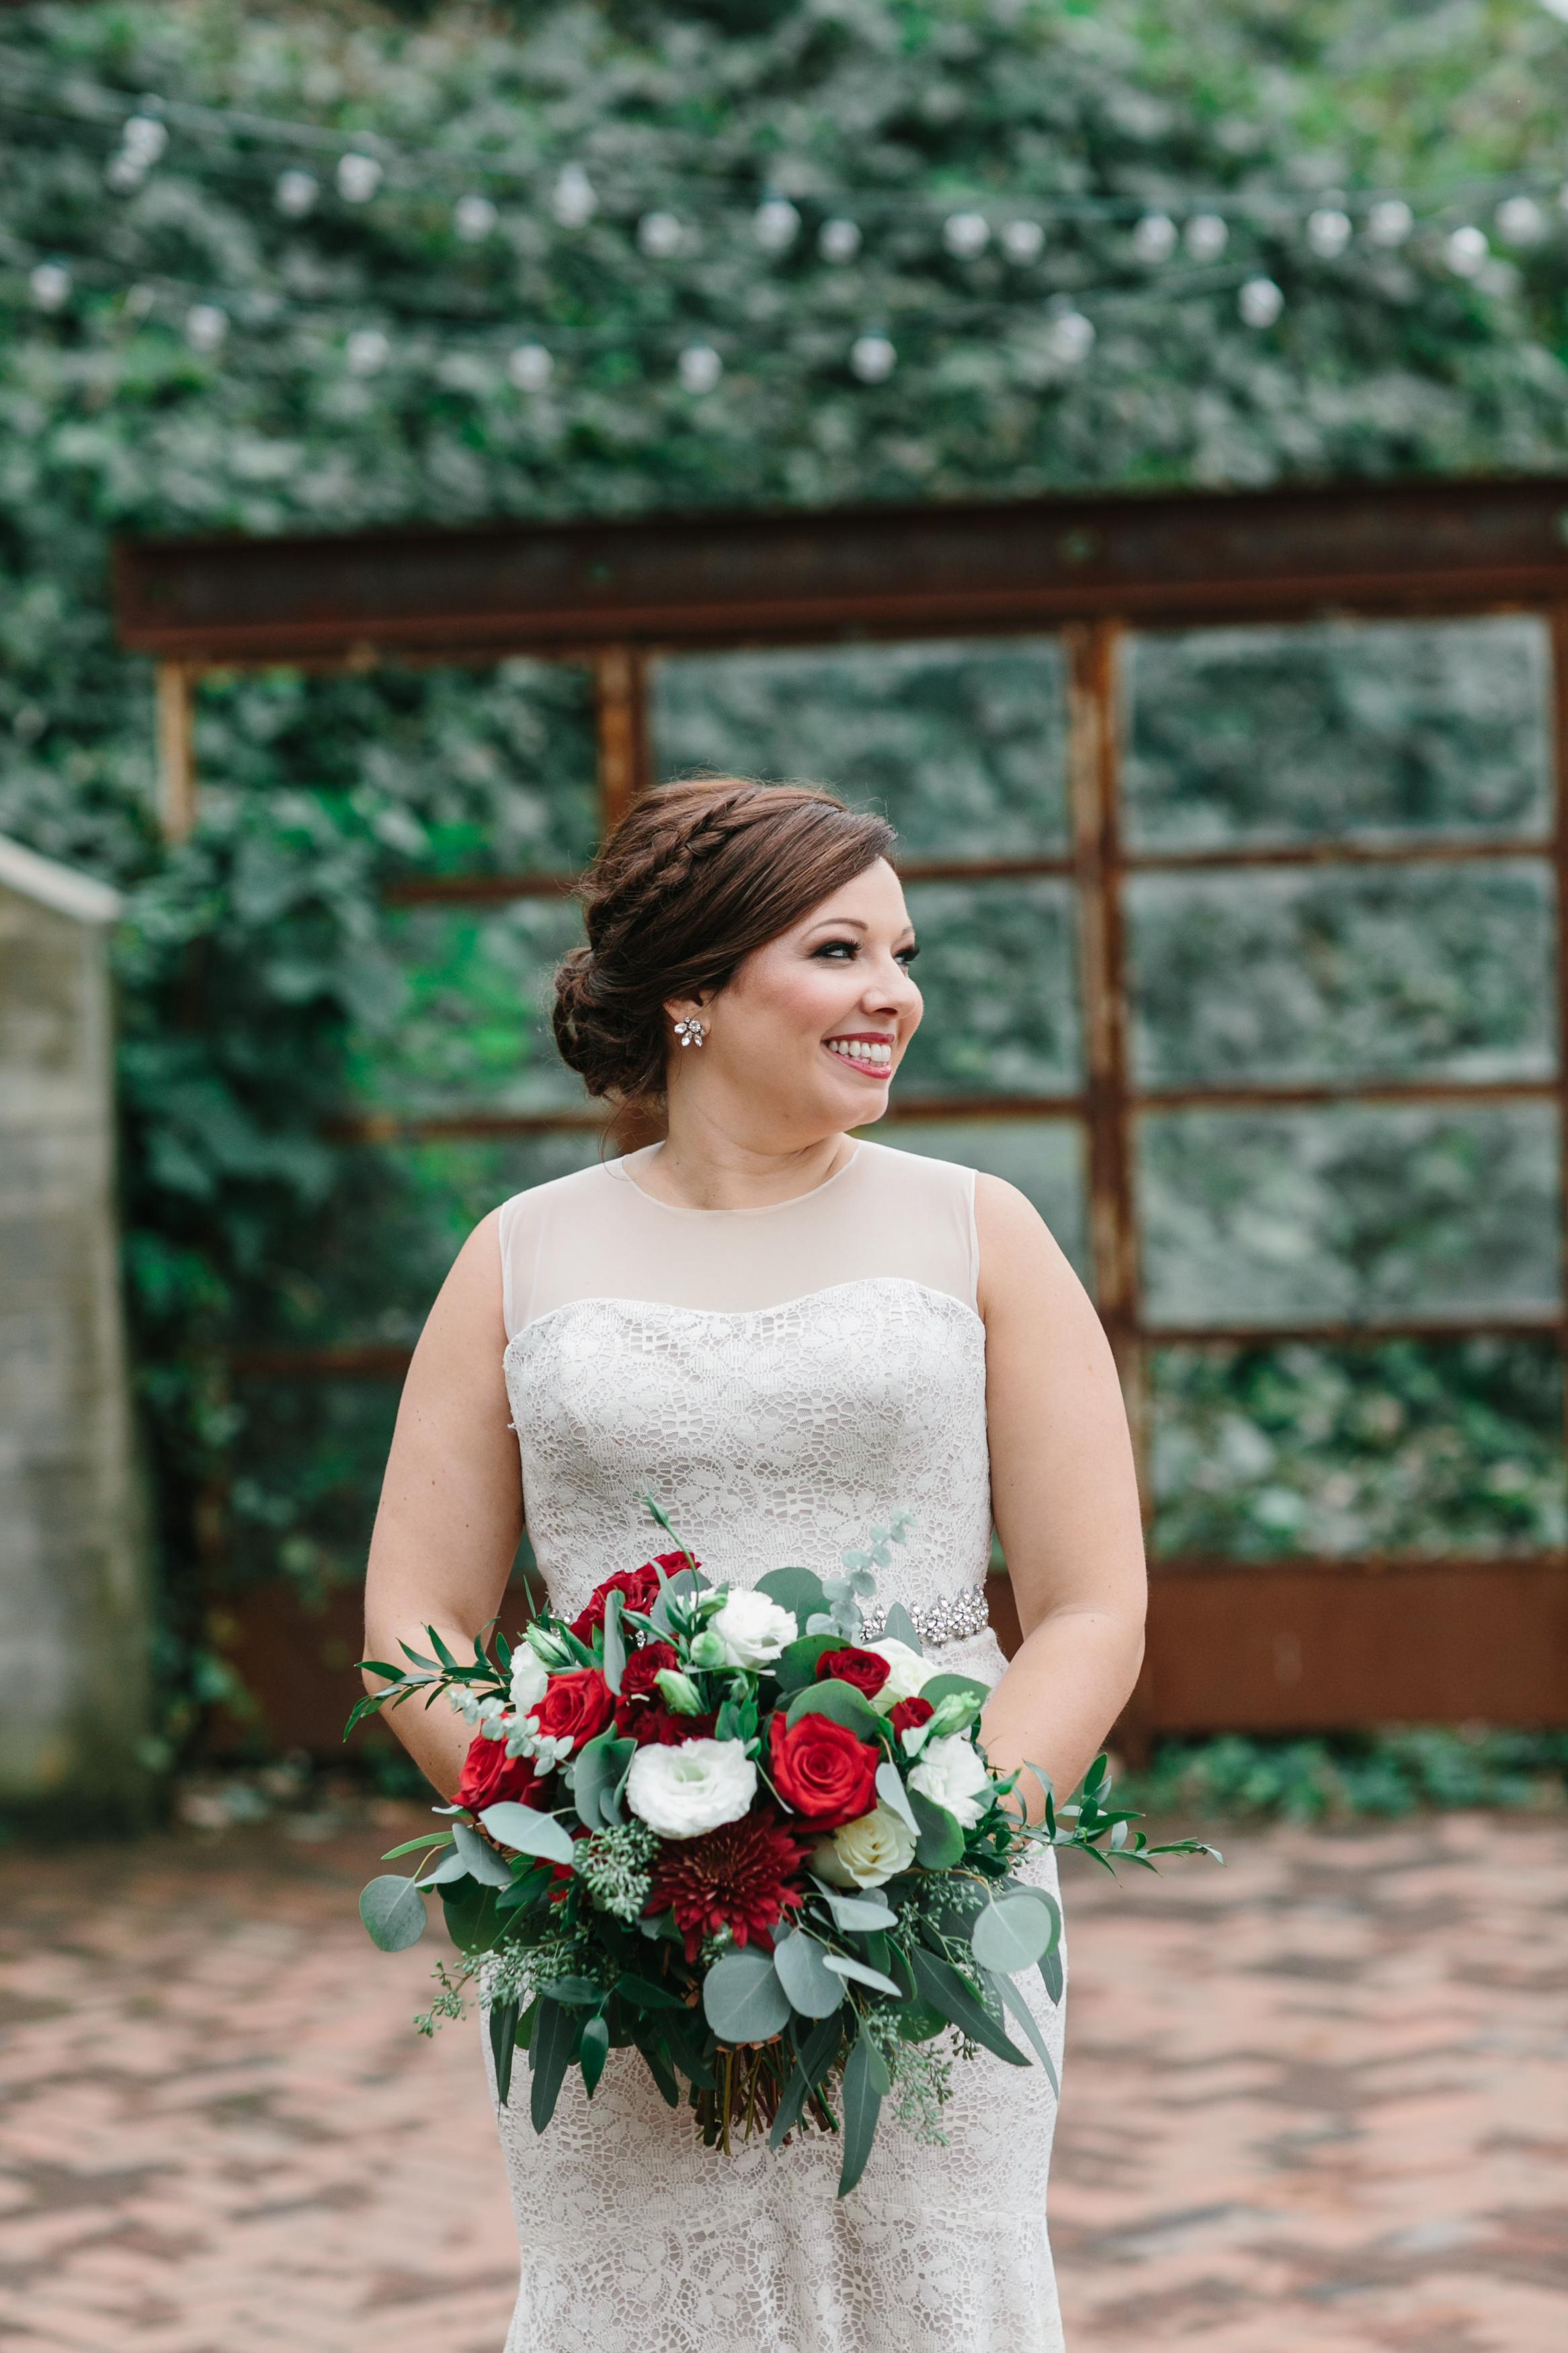 Jessica_Bryan_Wedding_Standard_Knoxville_Abigail_Malone_Photography-207.jpg